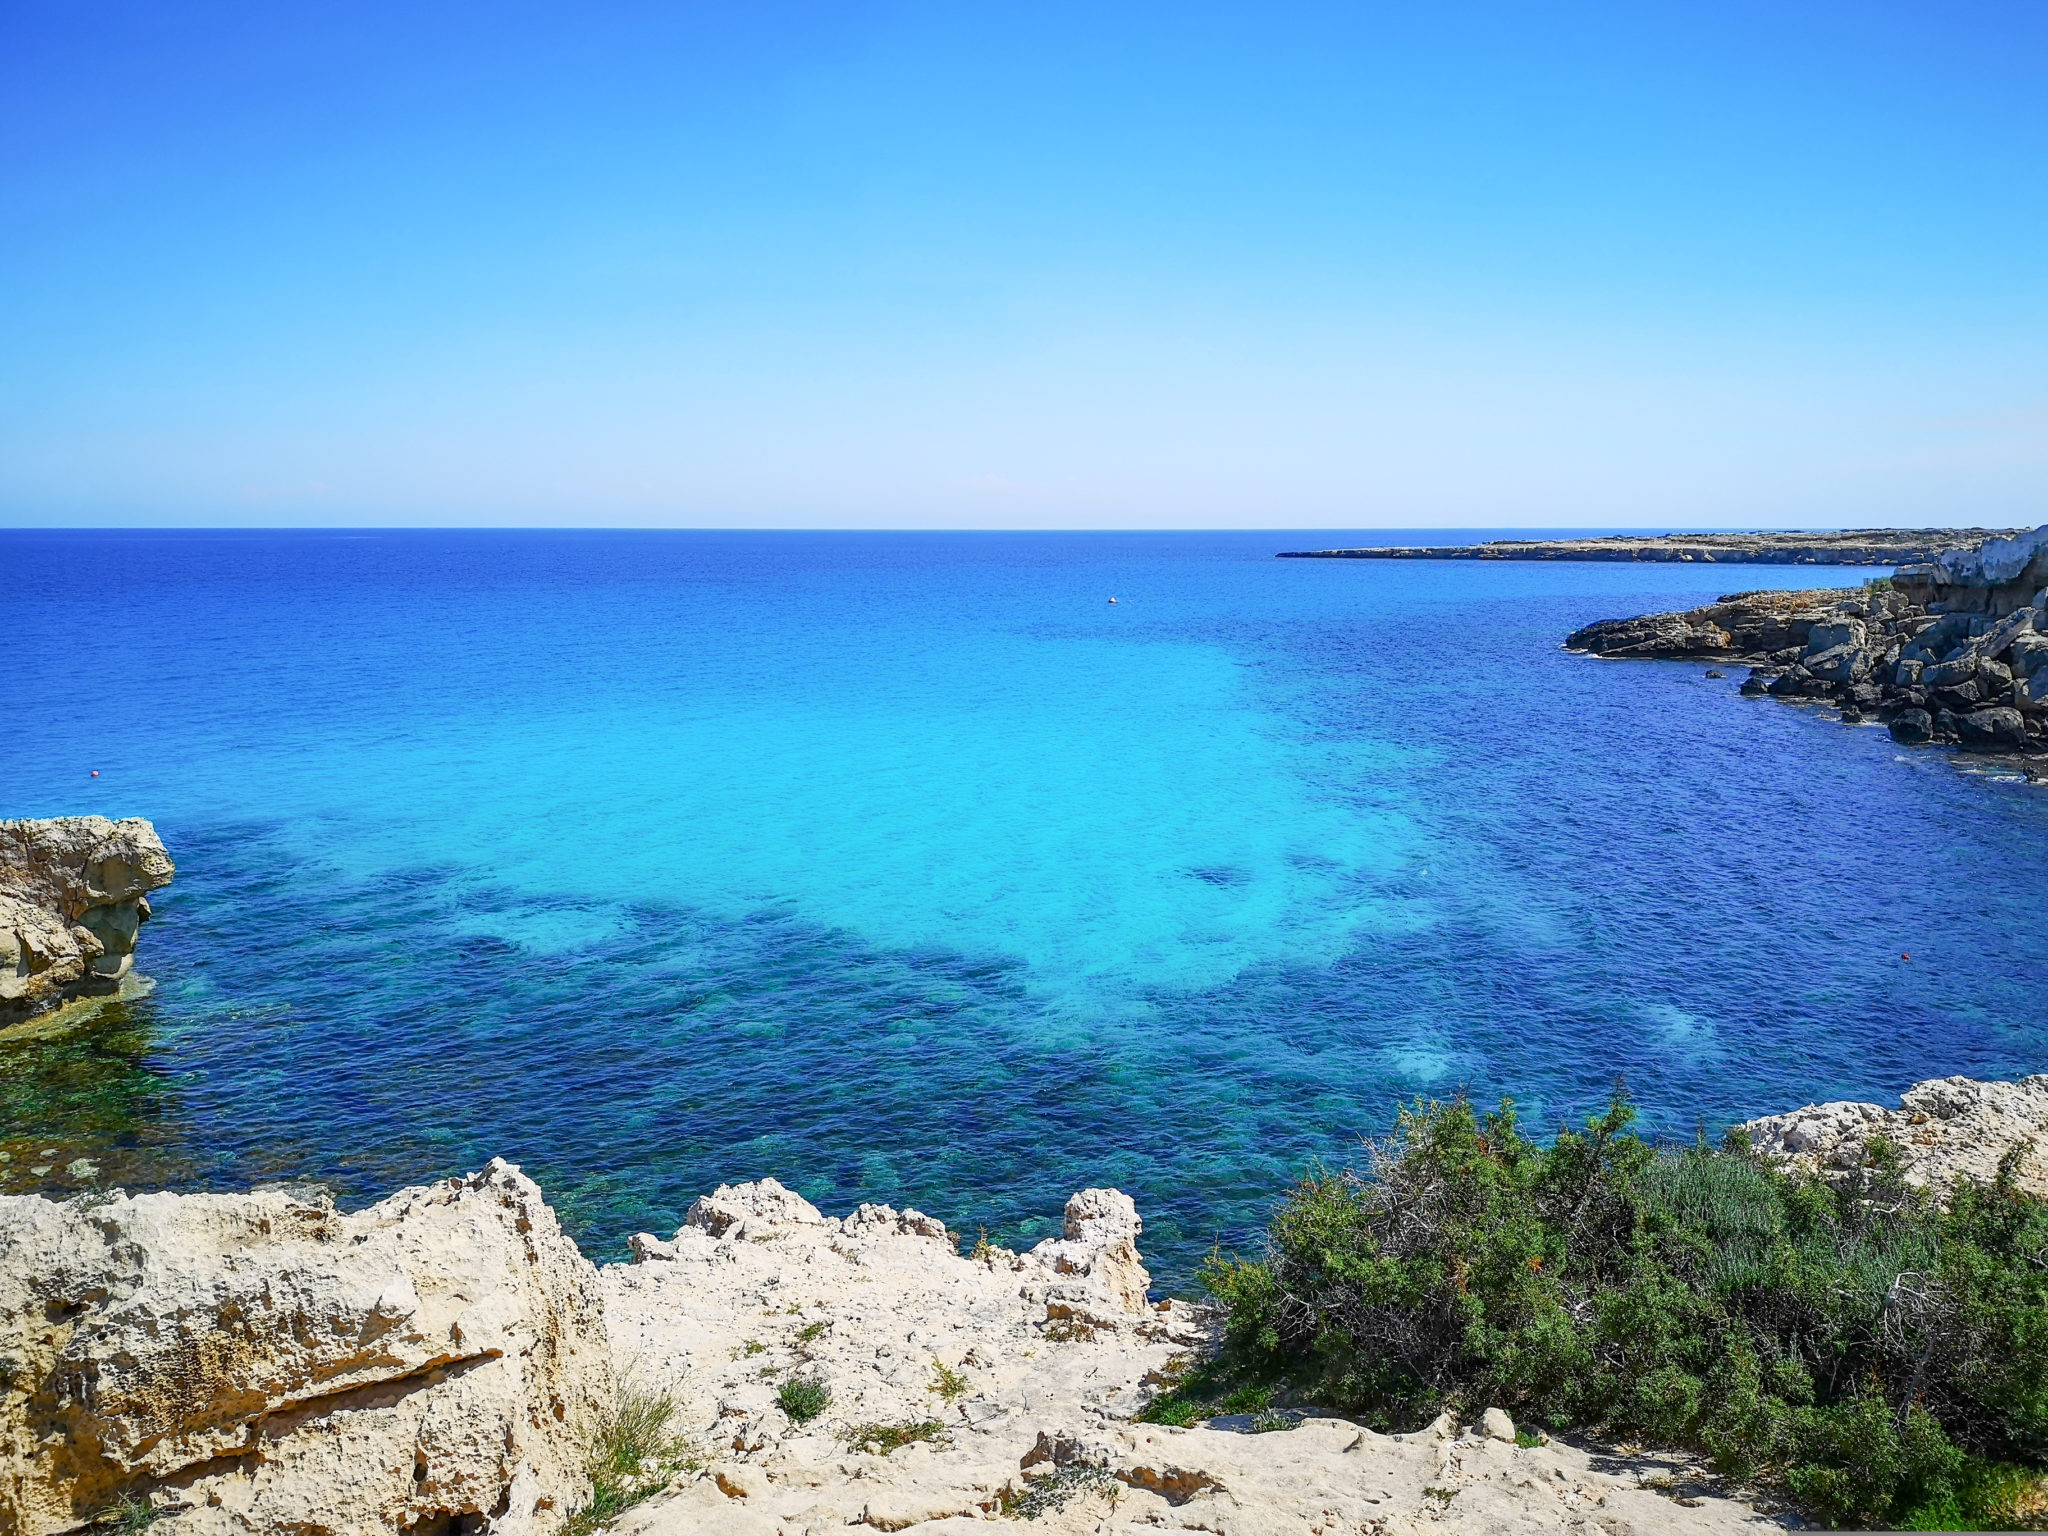 Best of Cyprus - Blue Lagoon Ayia Napa